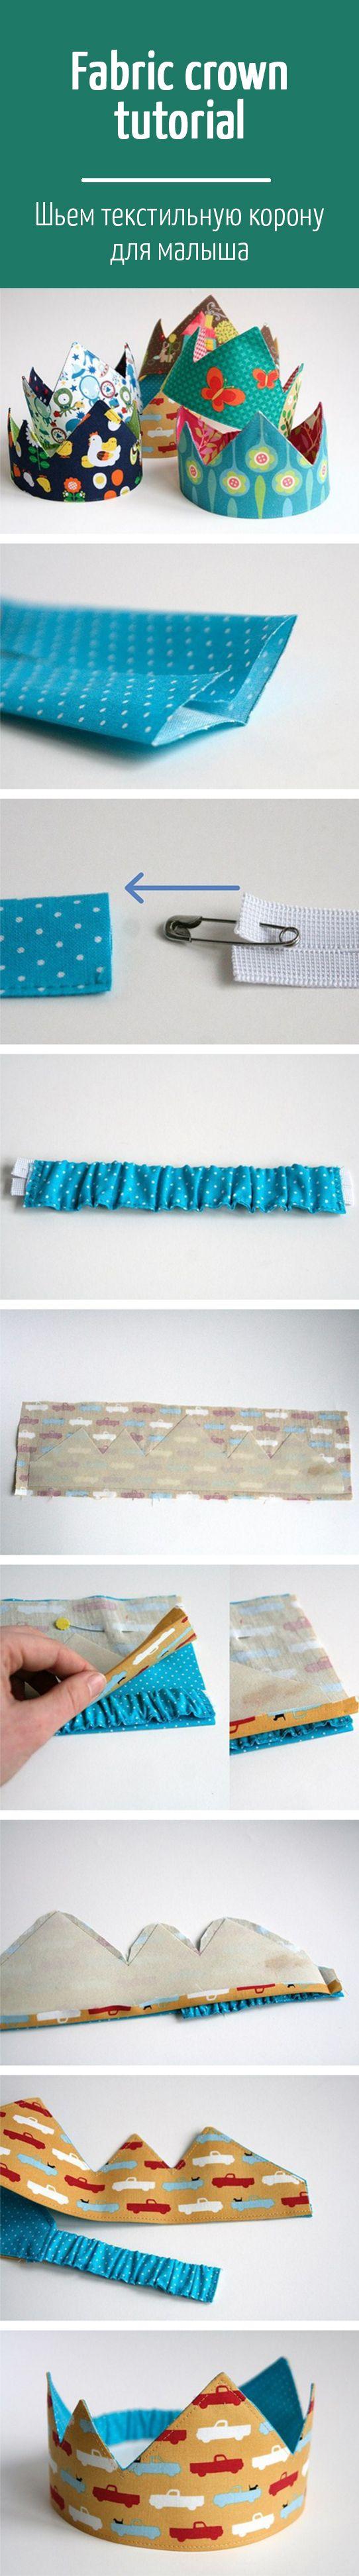 Fabric crown tutorial / Шьем текстильную корону для малыша